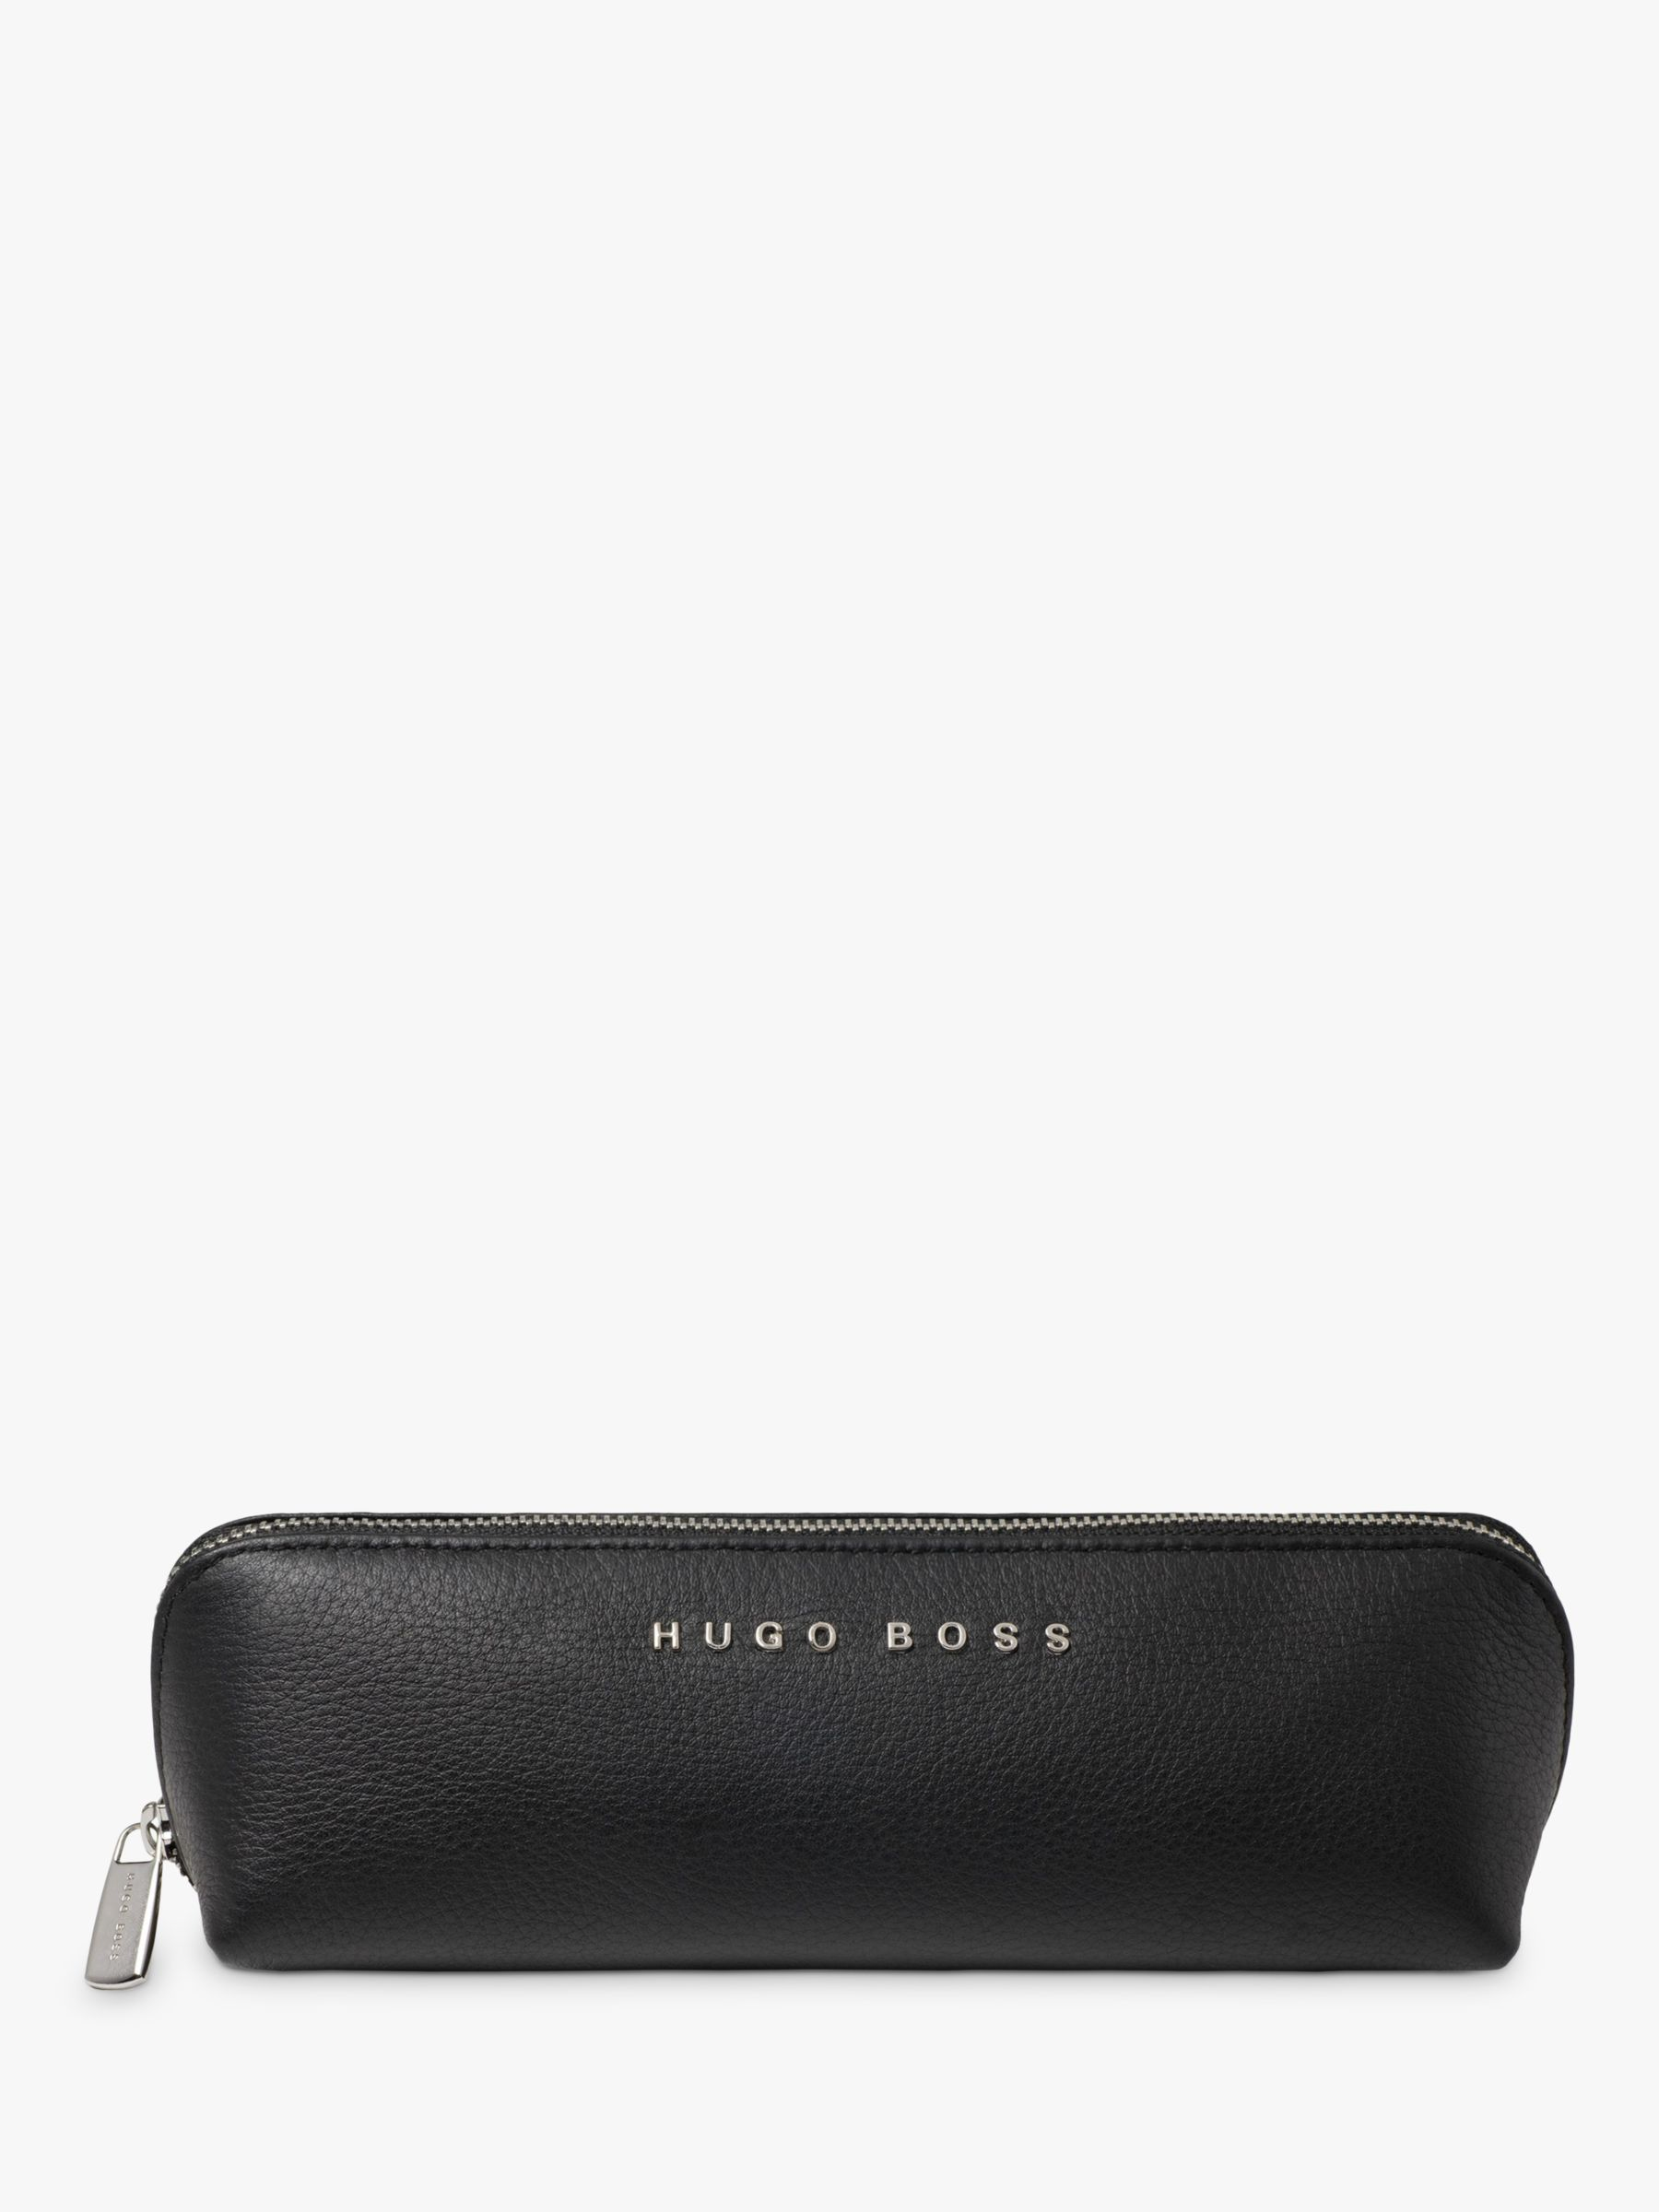 HUGO BOSS Storyline Leather Pen Case